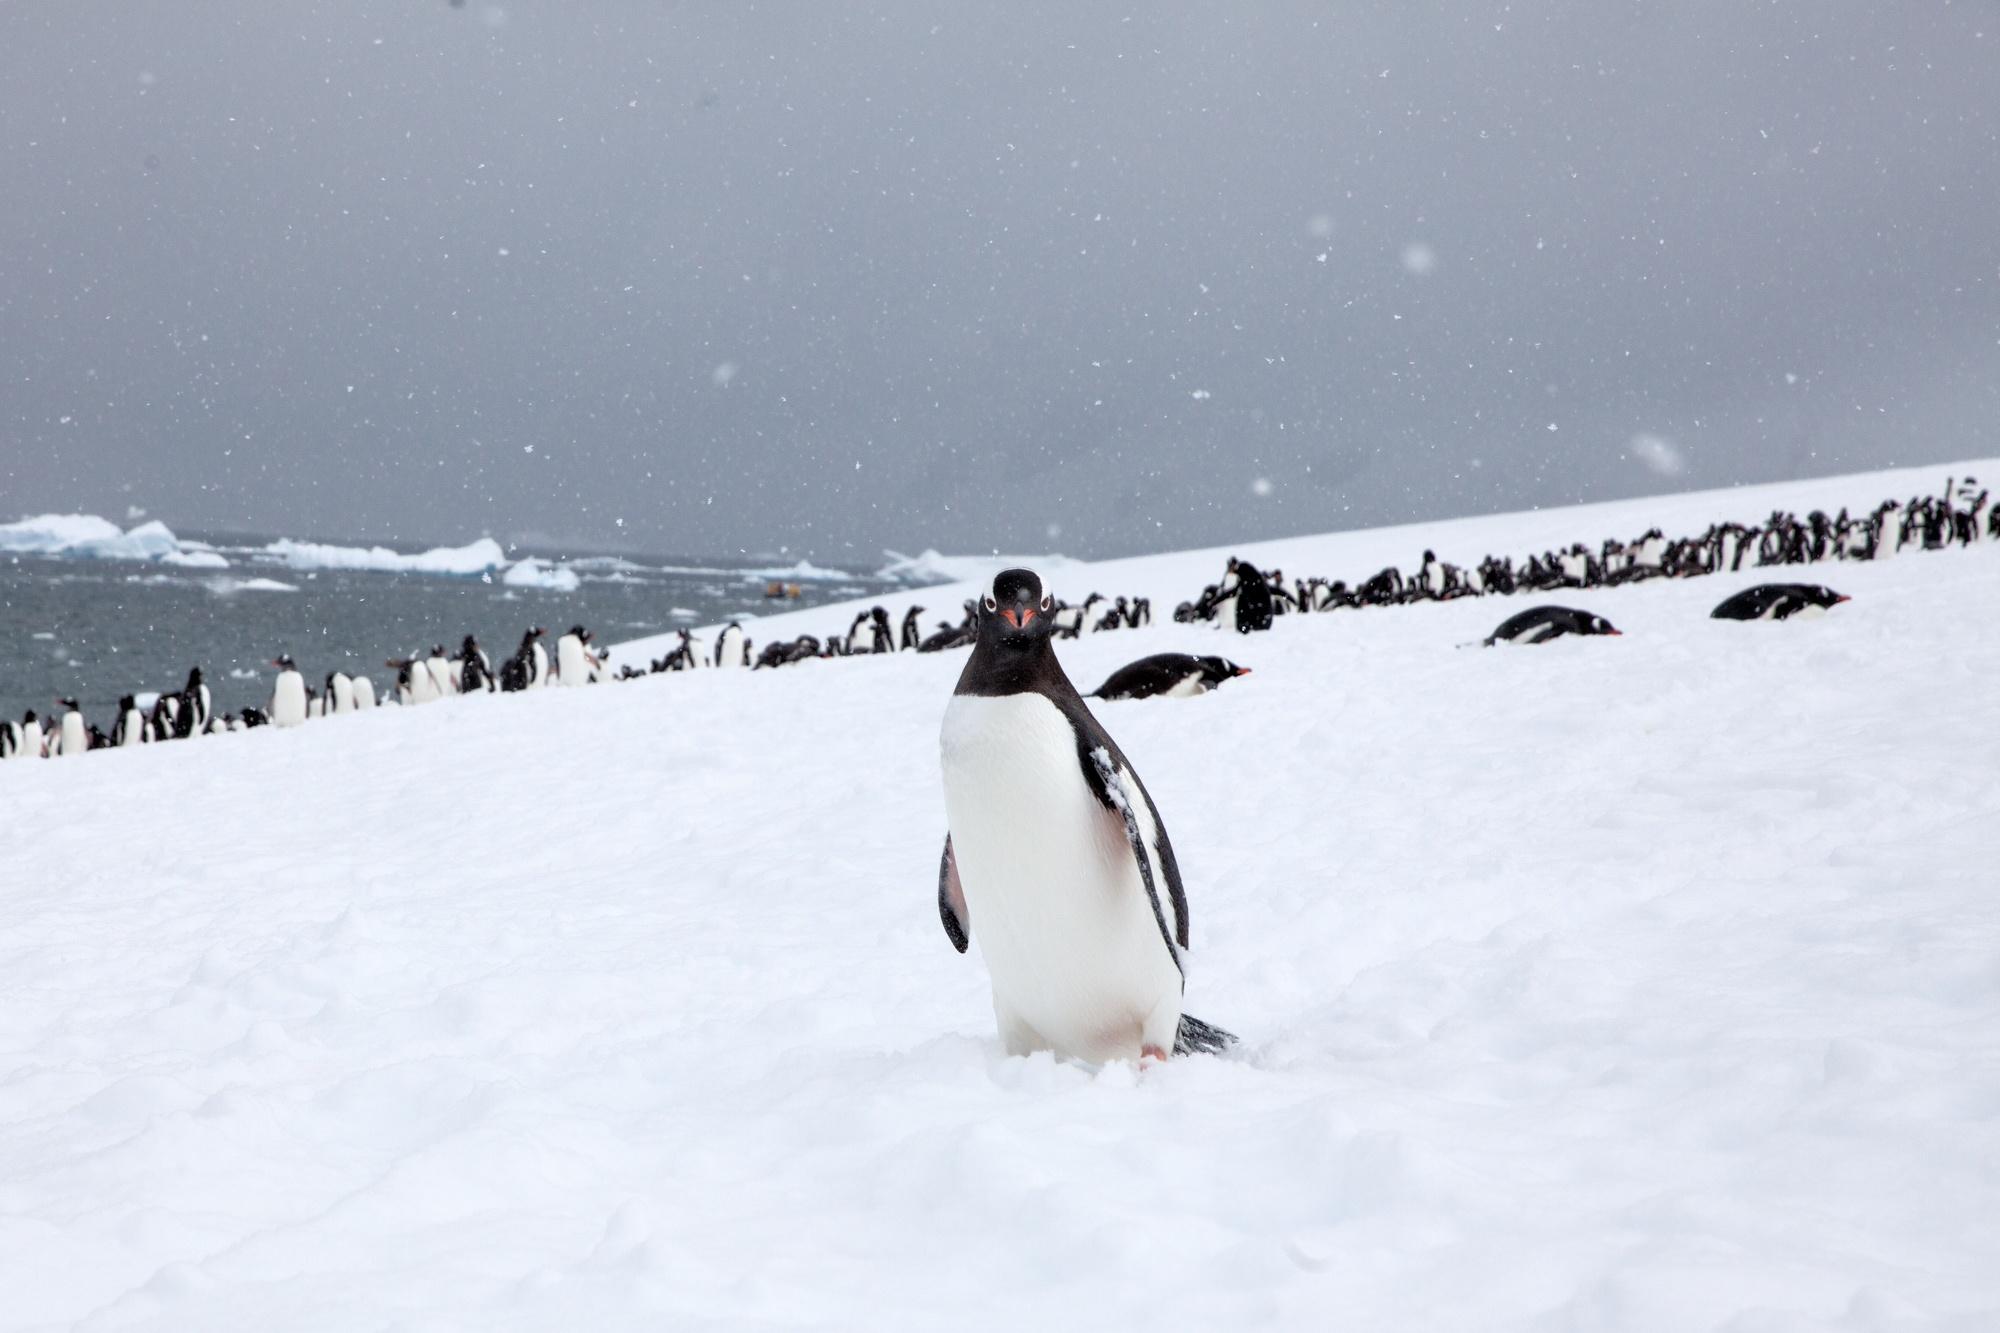 Sam_Crimmin_Antarctica_14-15--6.jpg